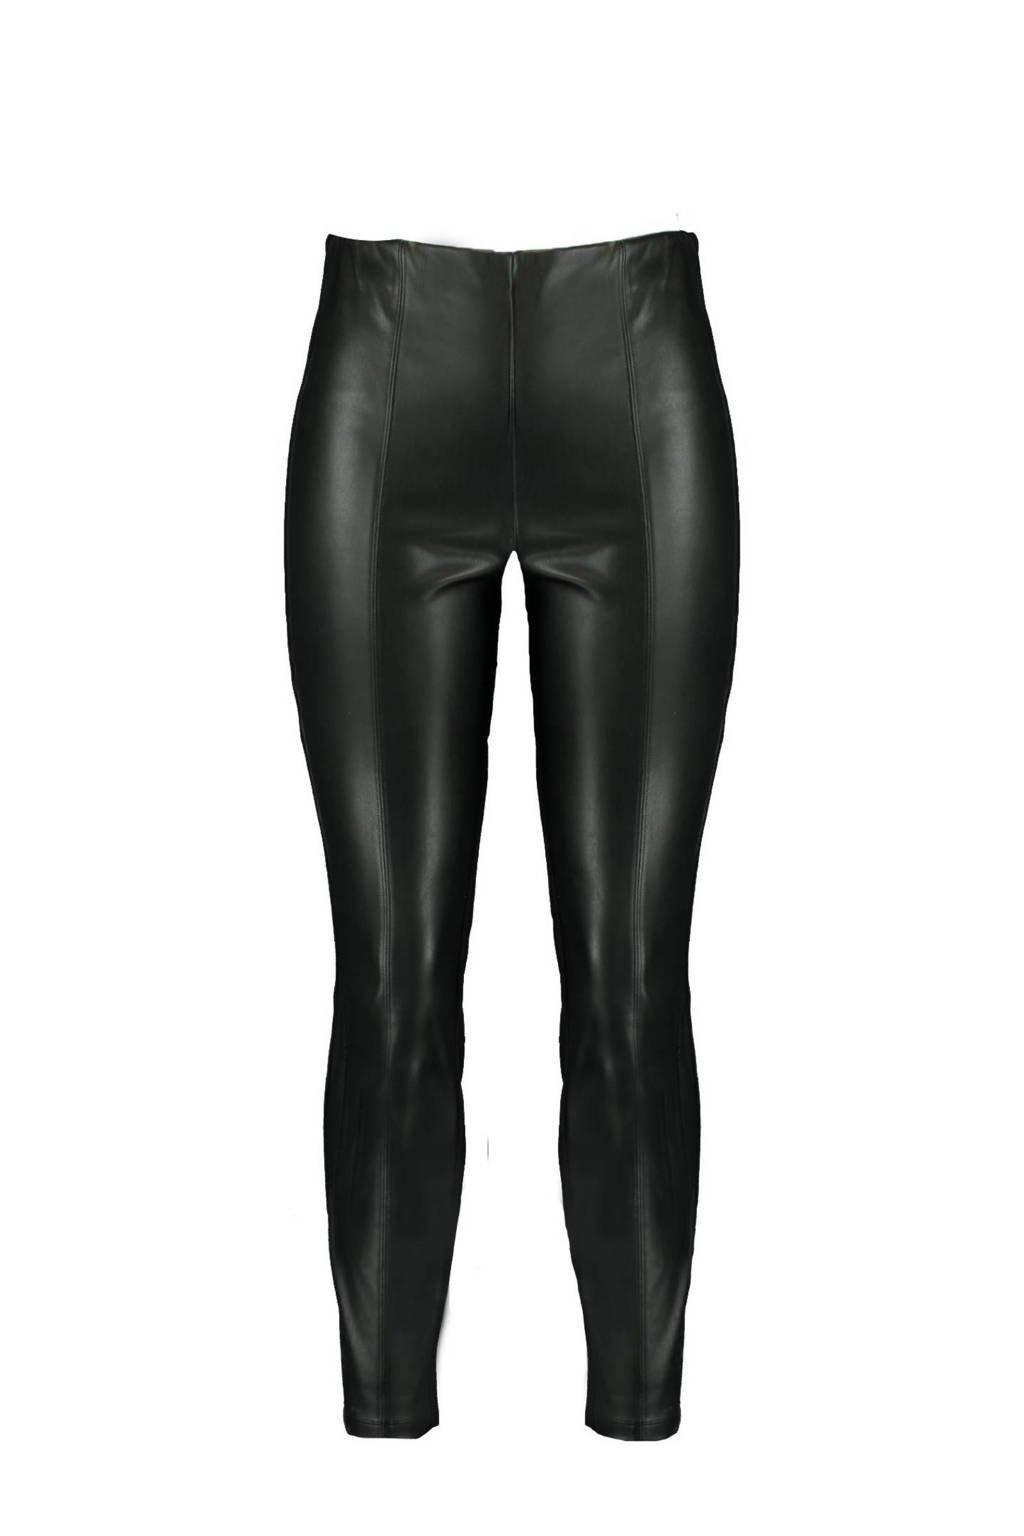 MS Mode Plus Size imitatieleren legging zwart, Zwart